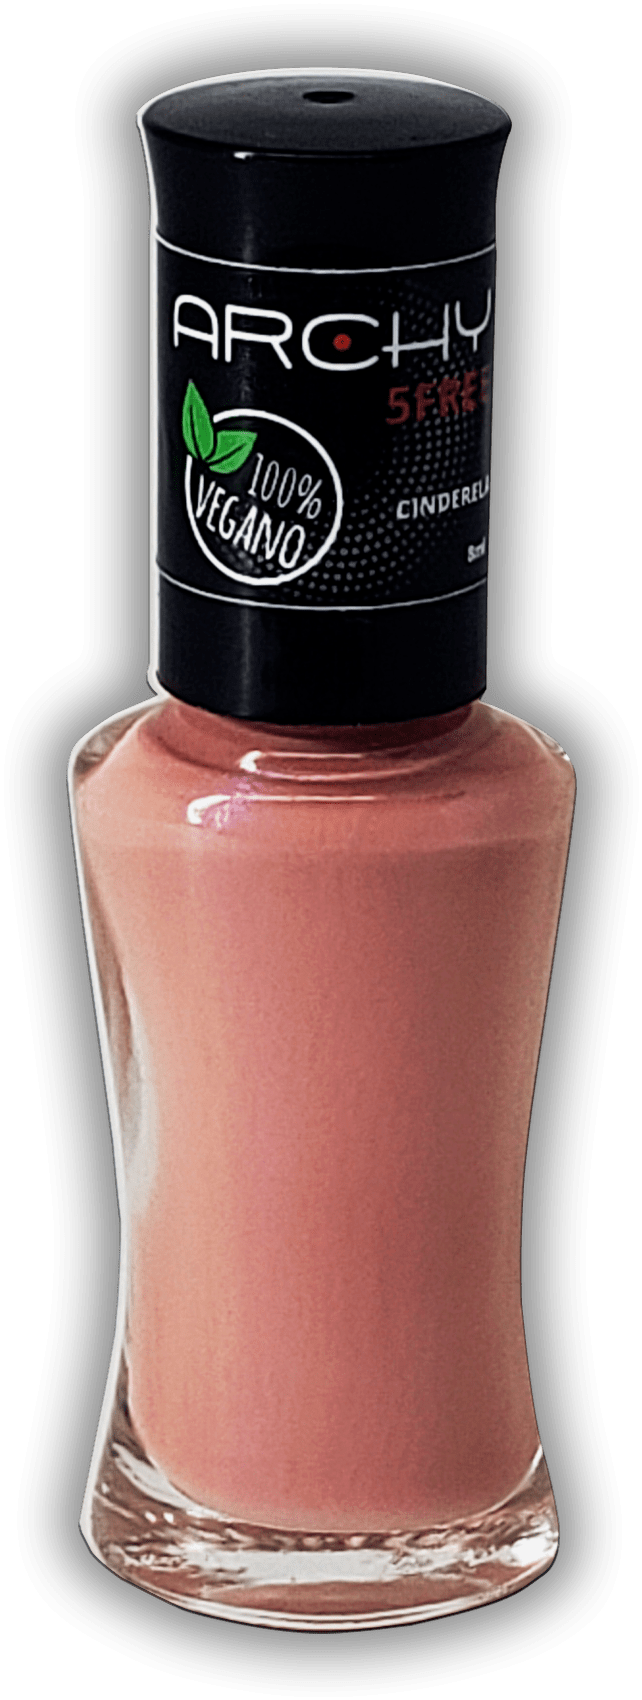 Esmalte Vegano 5 Free Cinderela - Archy Make Up